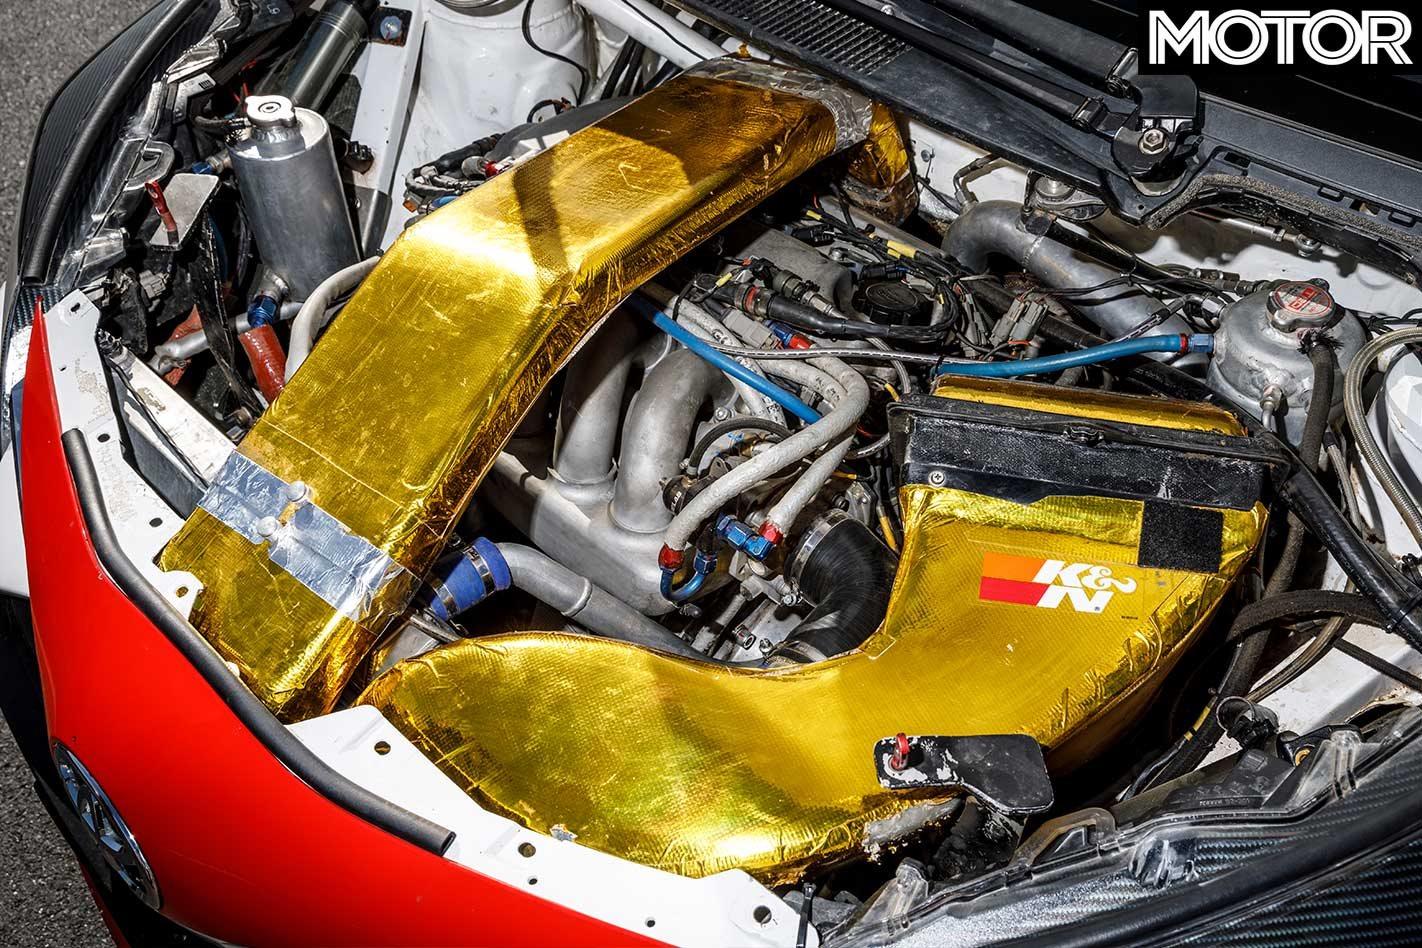 2019 Toyota Yaris AP4 rally car review